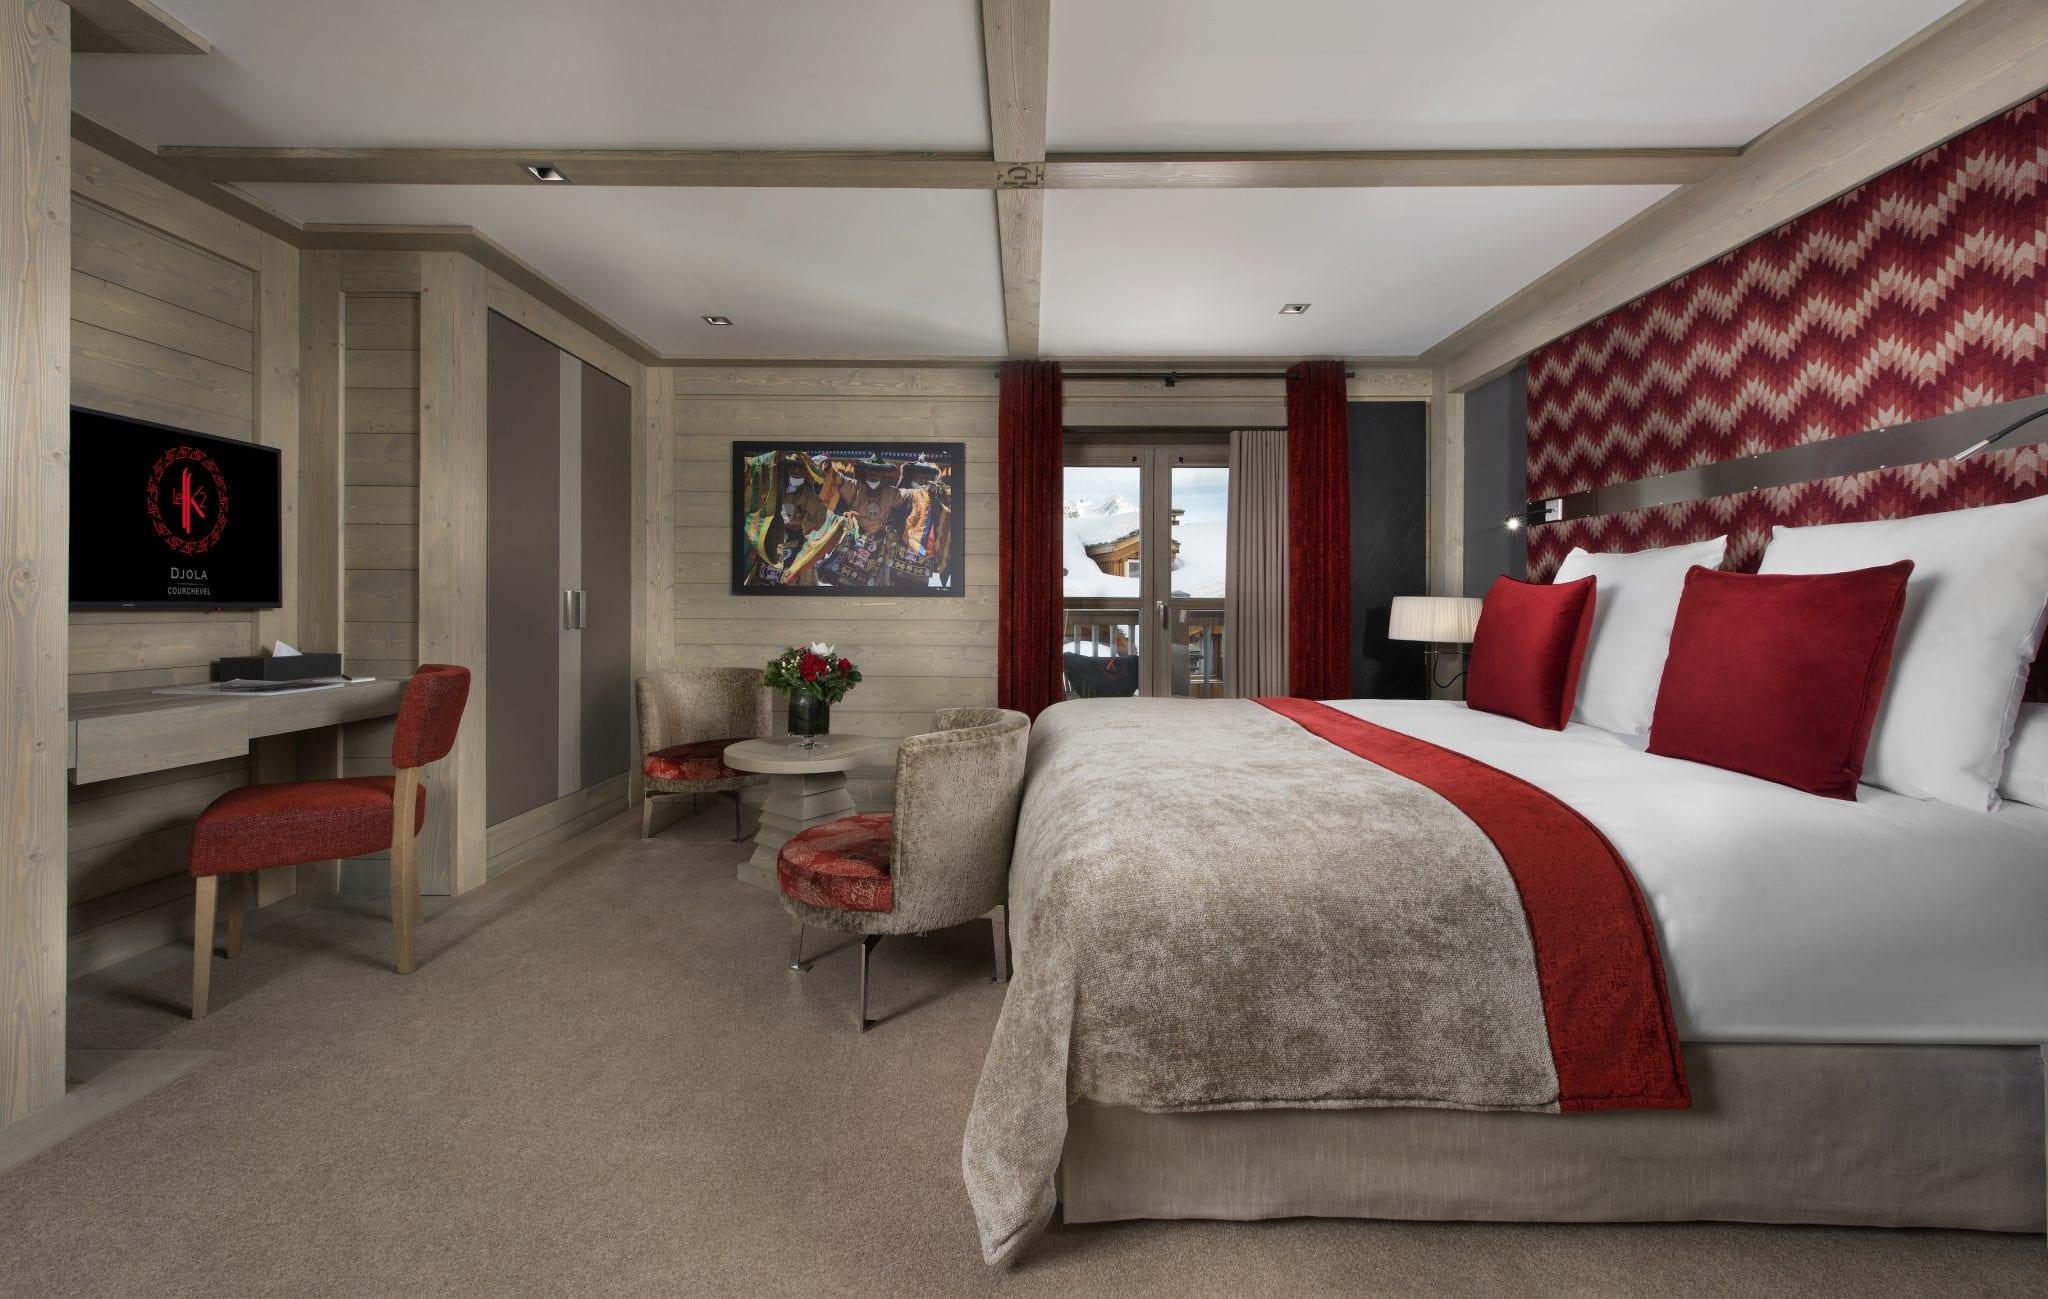 lek2djola-32-comfort-room